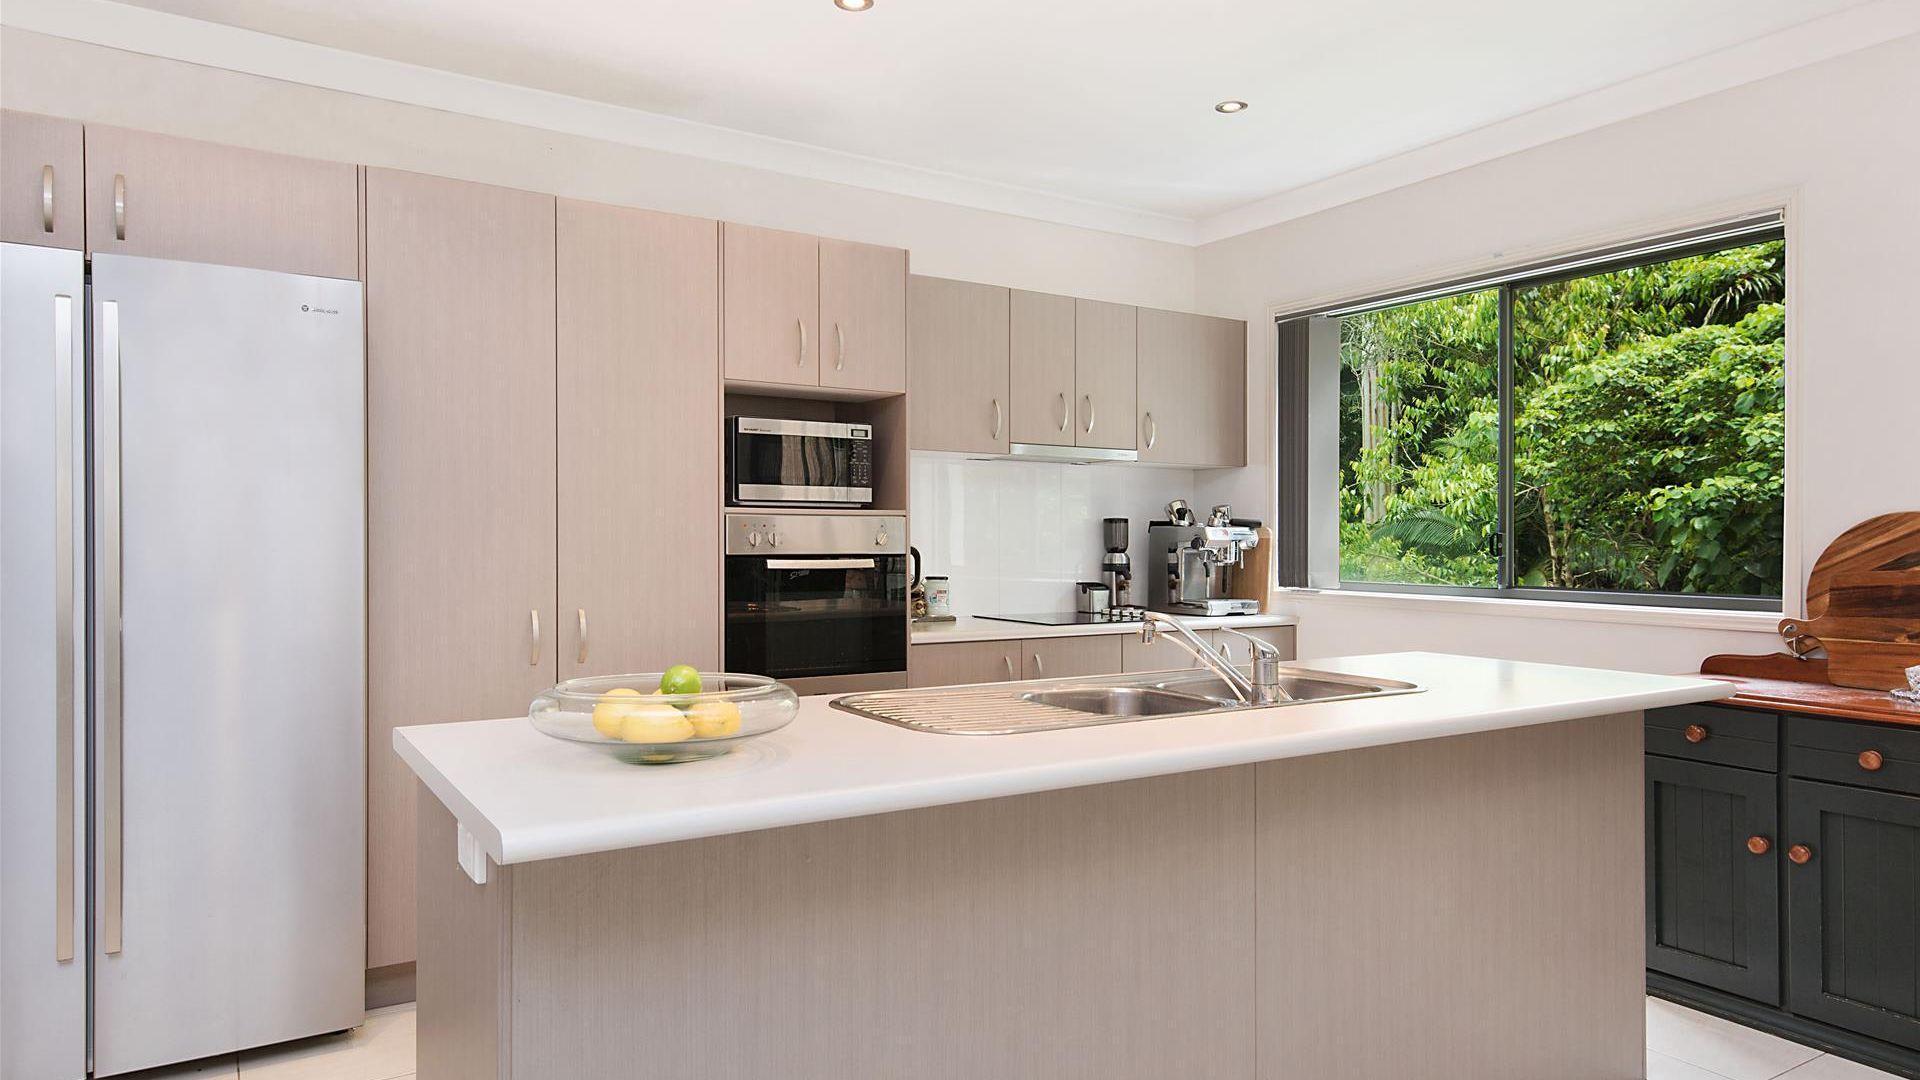 59 Martins Creek Road, Buderim QLD 4556, Image 2